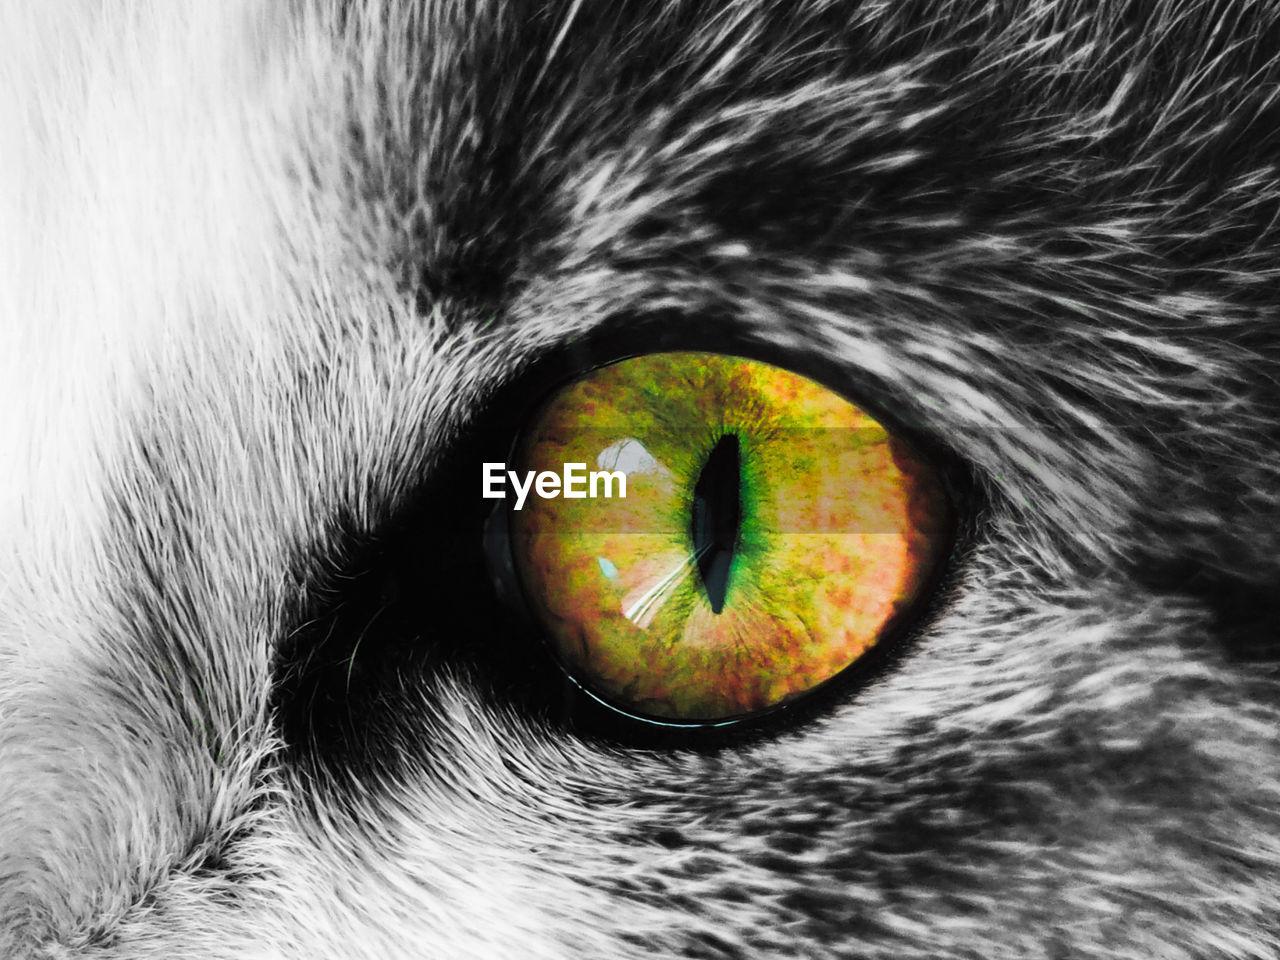 one animal, pets, domestic animals, domestic cat, animal themes, mammal, close-up, no people, indoors, feline, portrait, day, eyeball